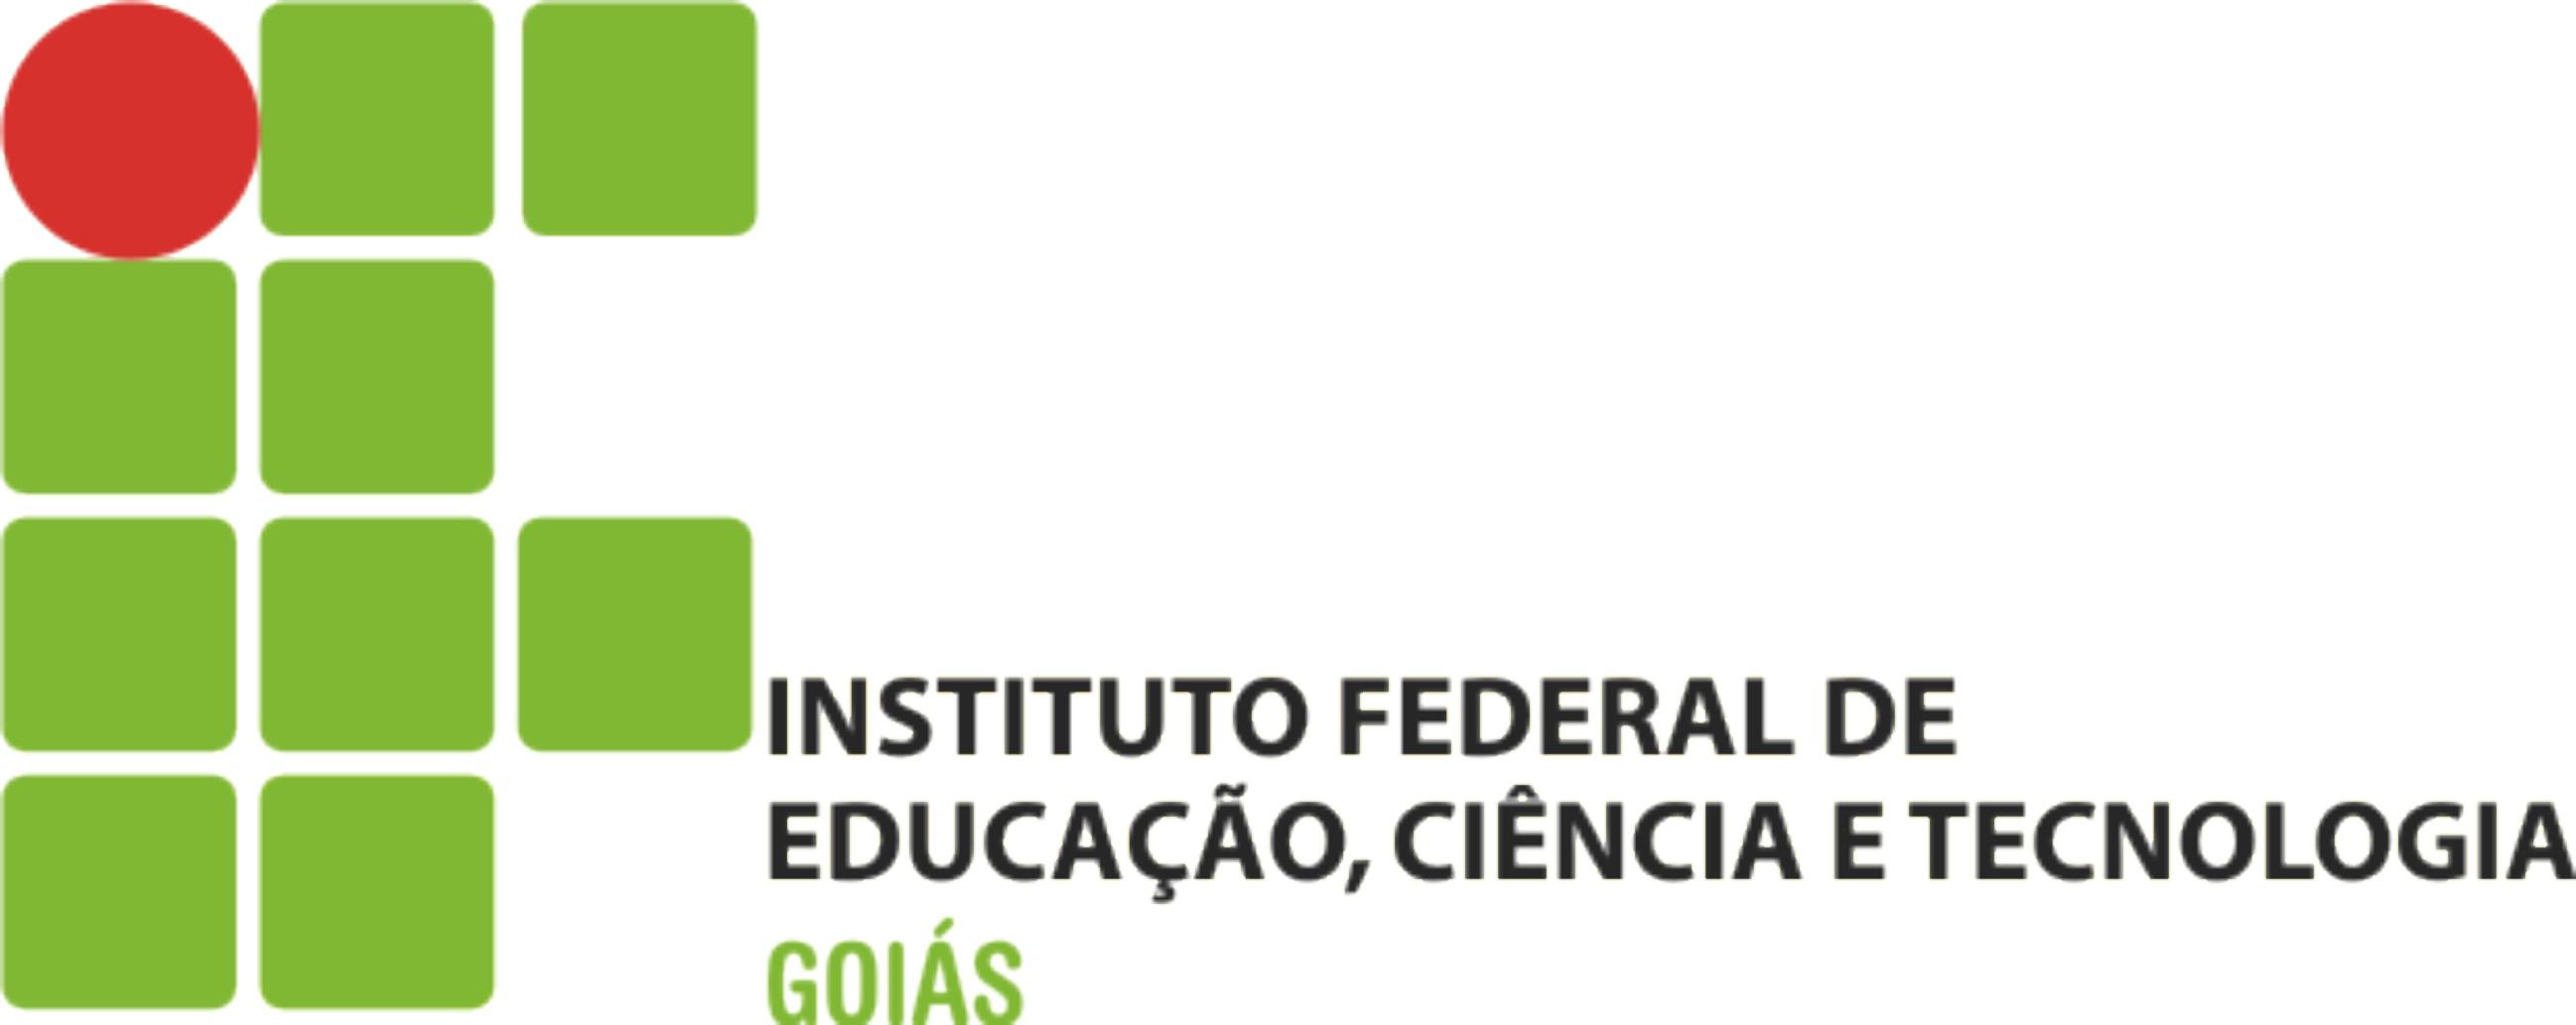 IFG divulga resultado no Vestibular 2020/1